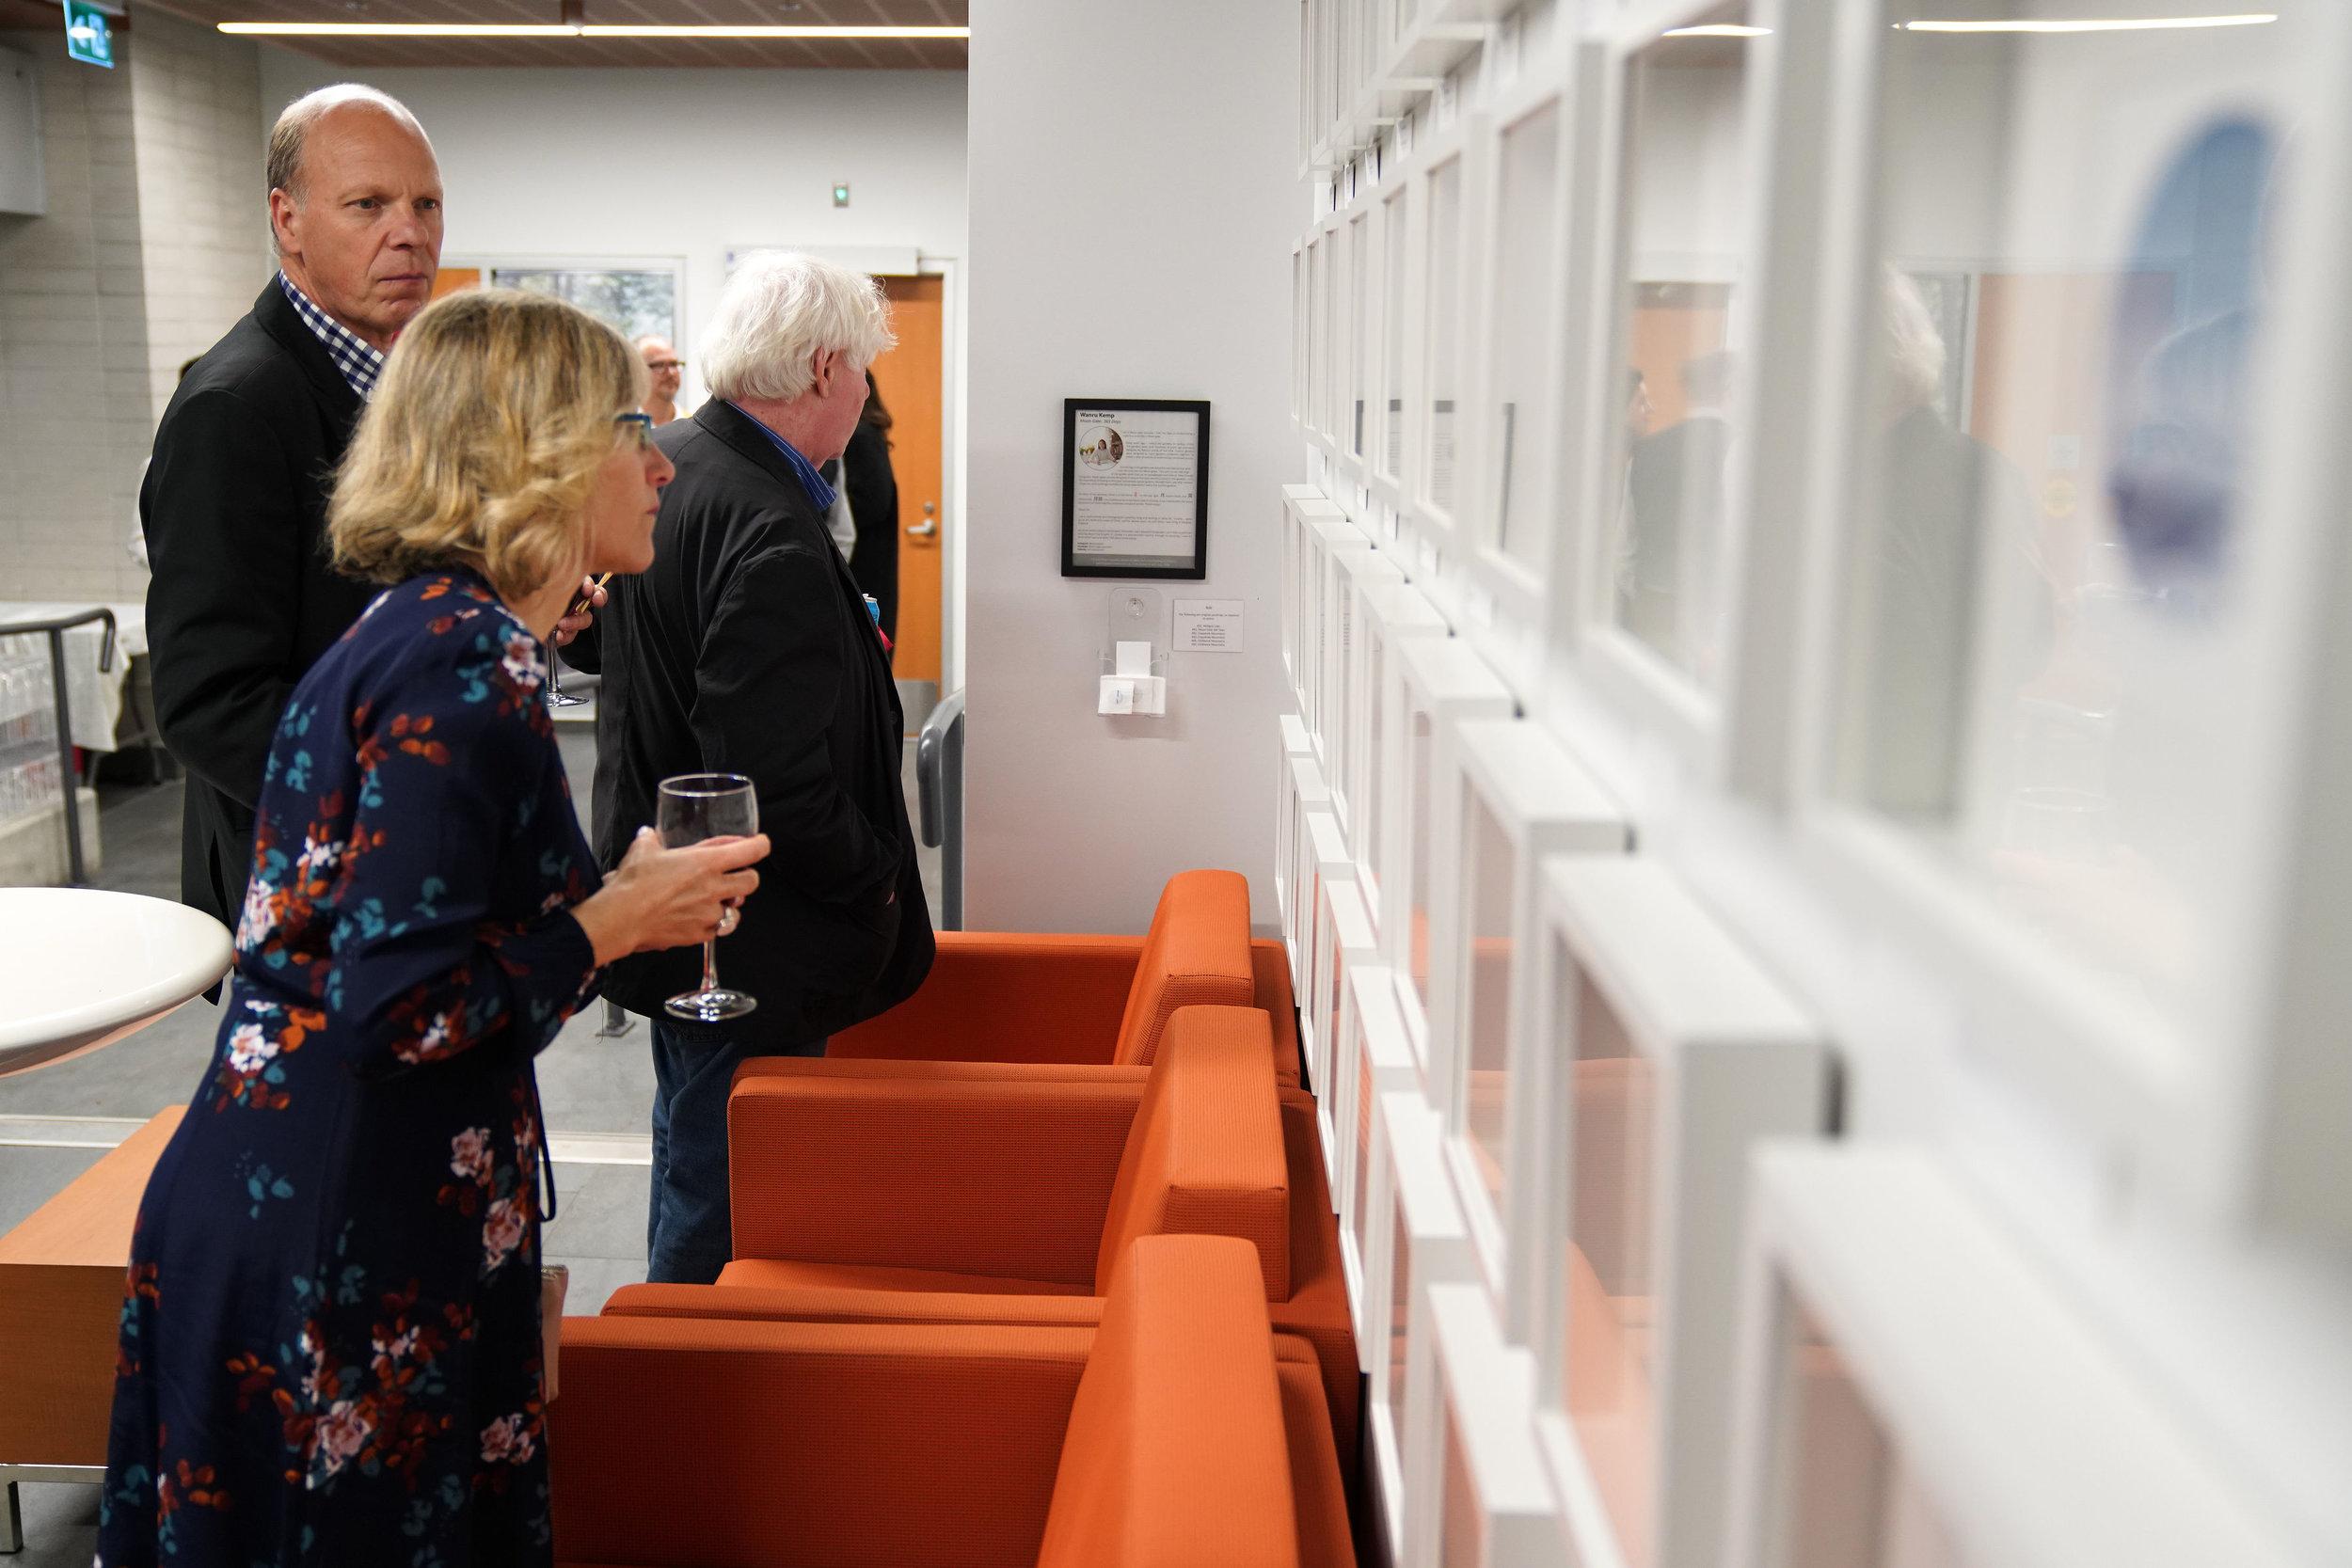 FANS Sponsor Stan Van Woerkens and guests view the art display